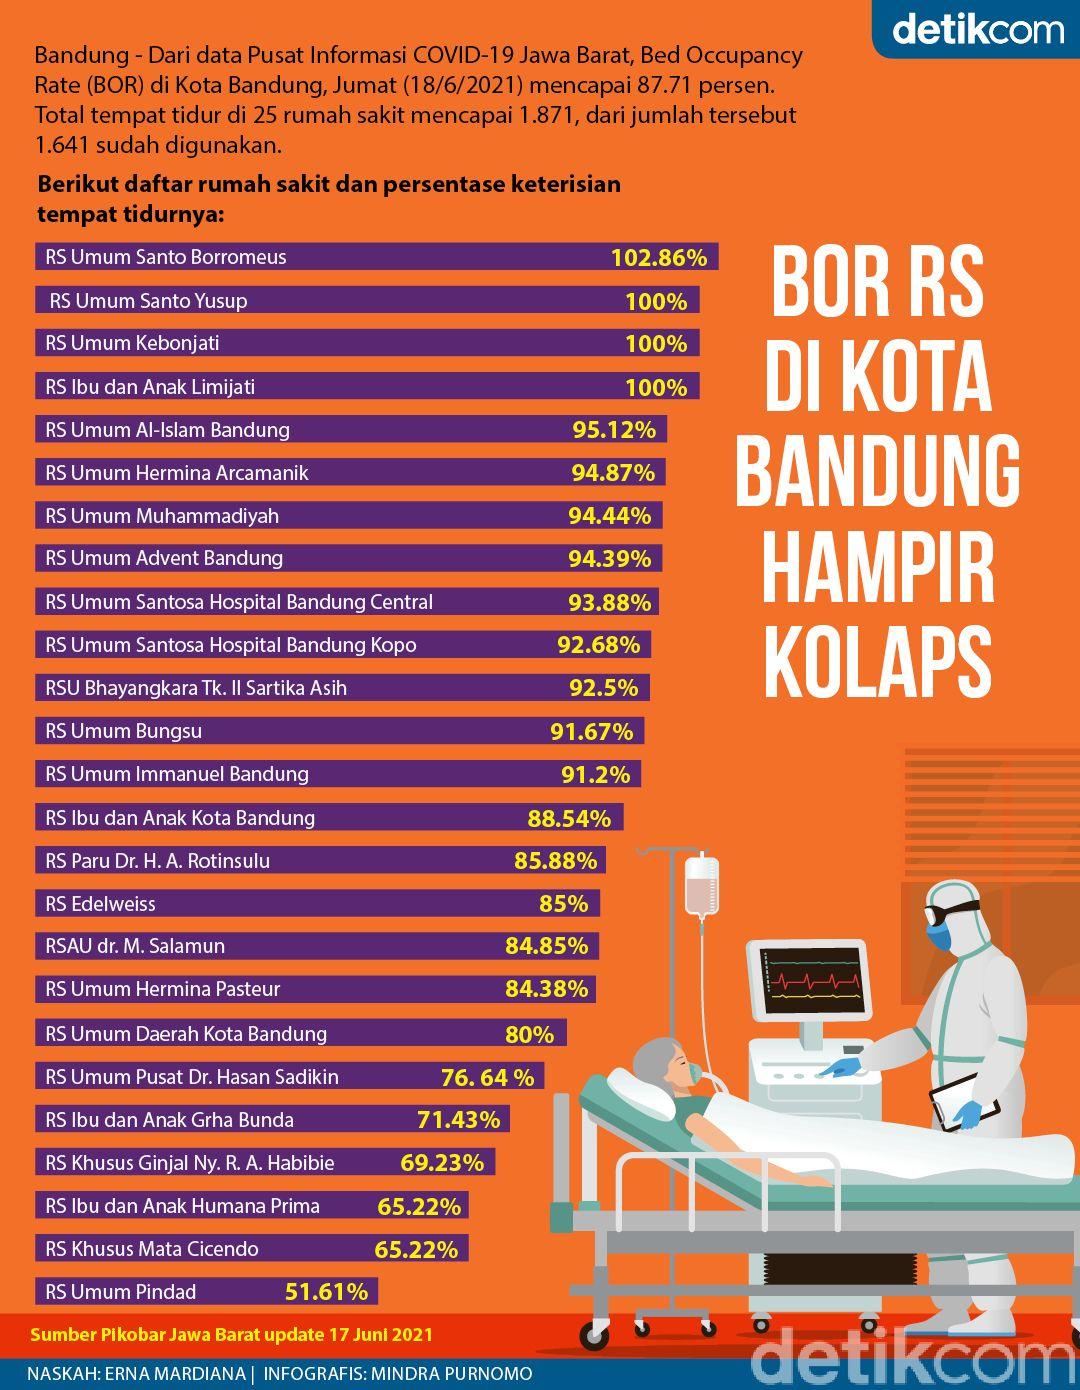 BOR RS di Kota Bandung